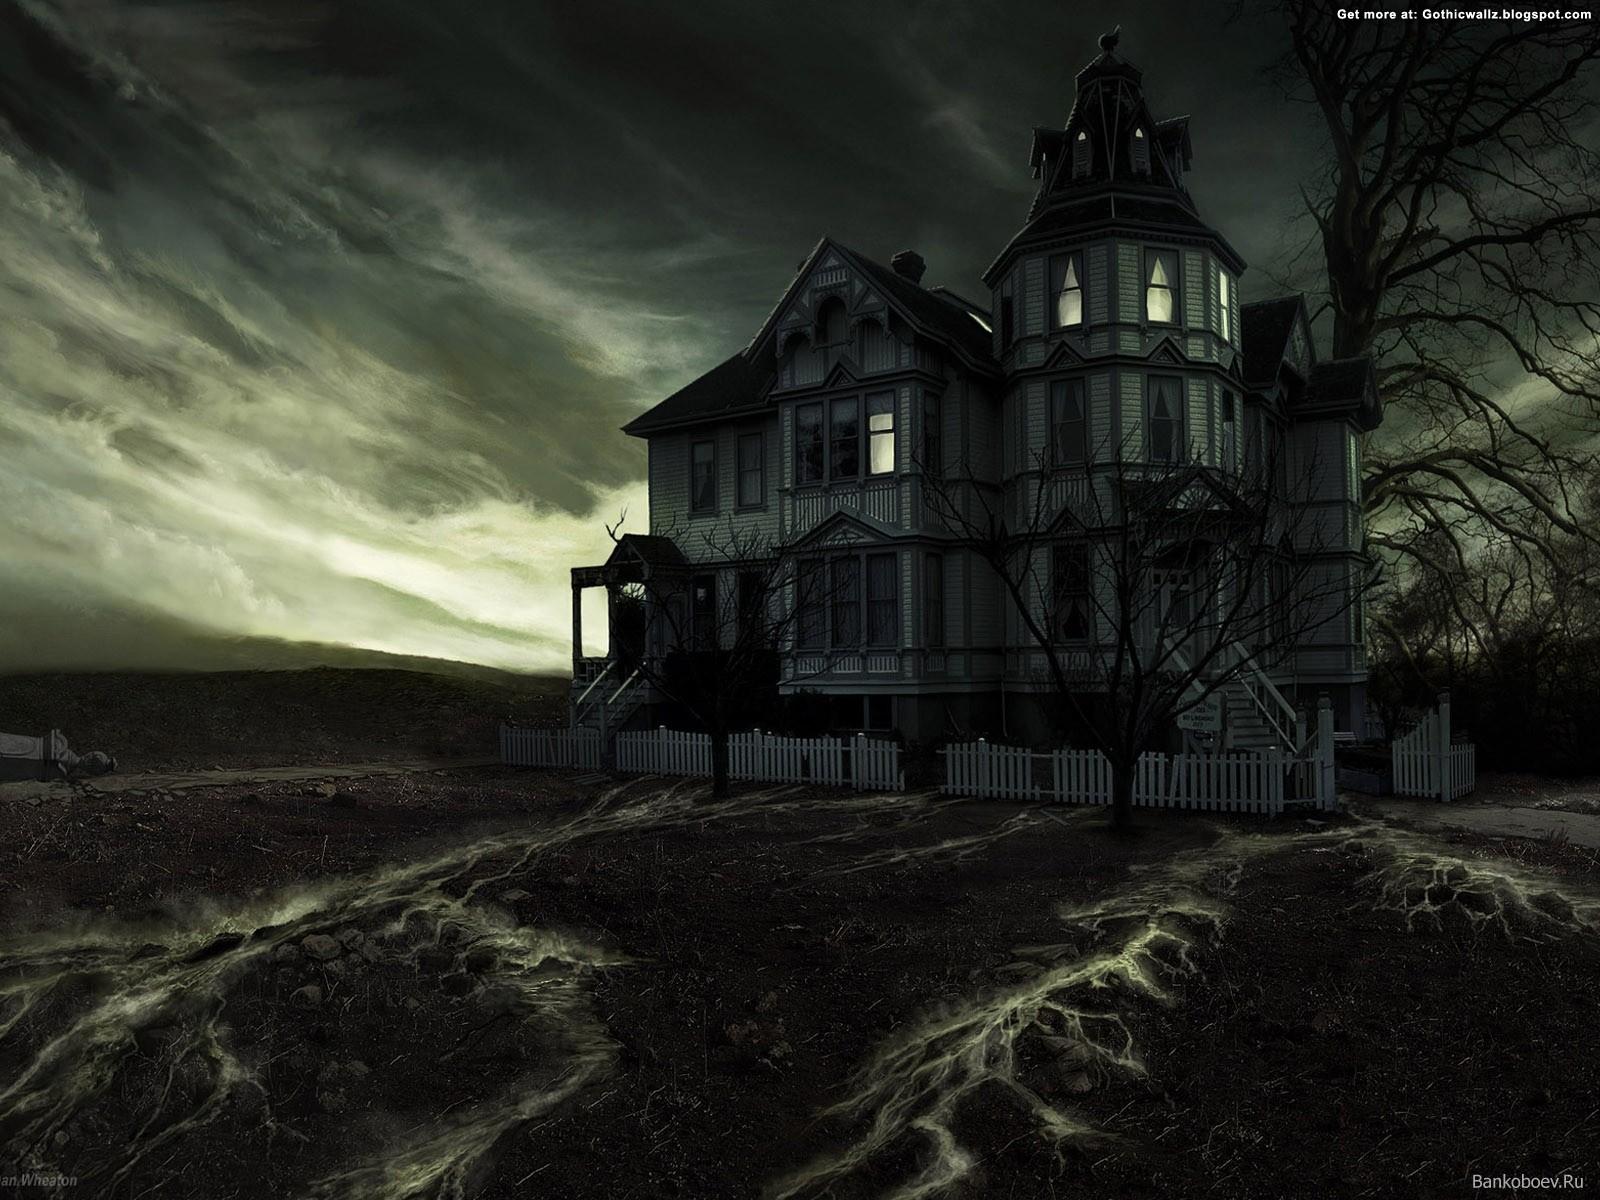 dark and gothic wallpapers | best free gothic wallpaper | dark